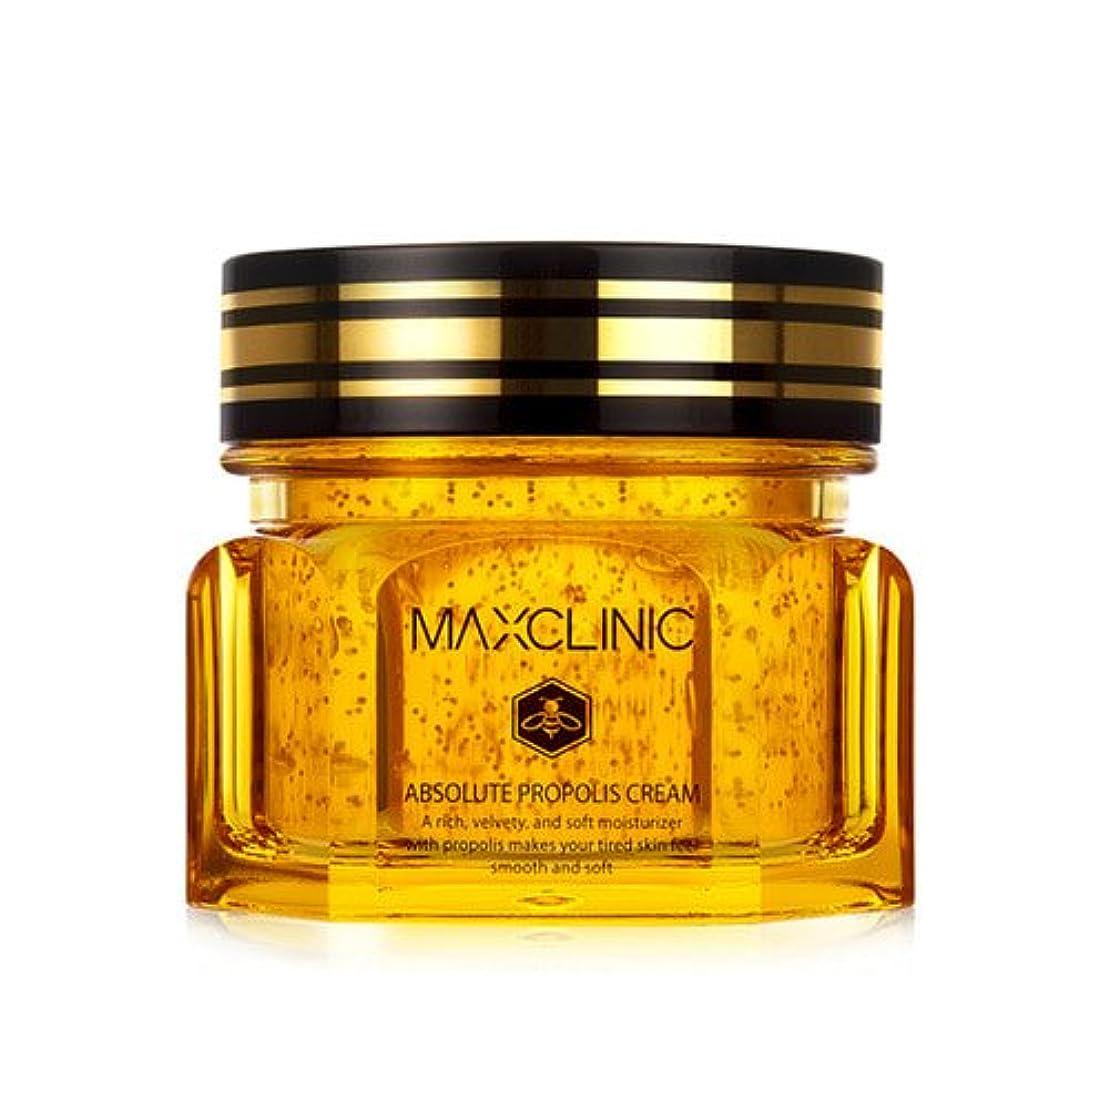 MAXCLINIC Absolute Propolis Cream 100ml/マックスクリニック アブソリュート プロポリス クリーム 100ml [並行輸入品]